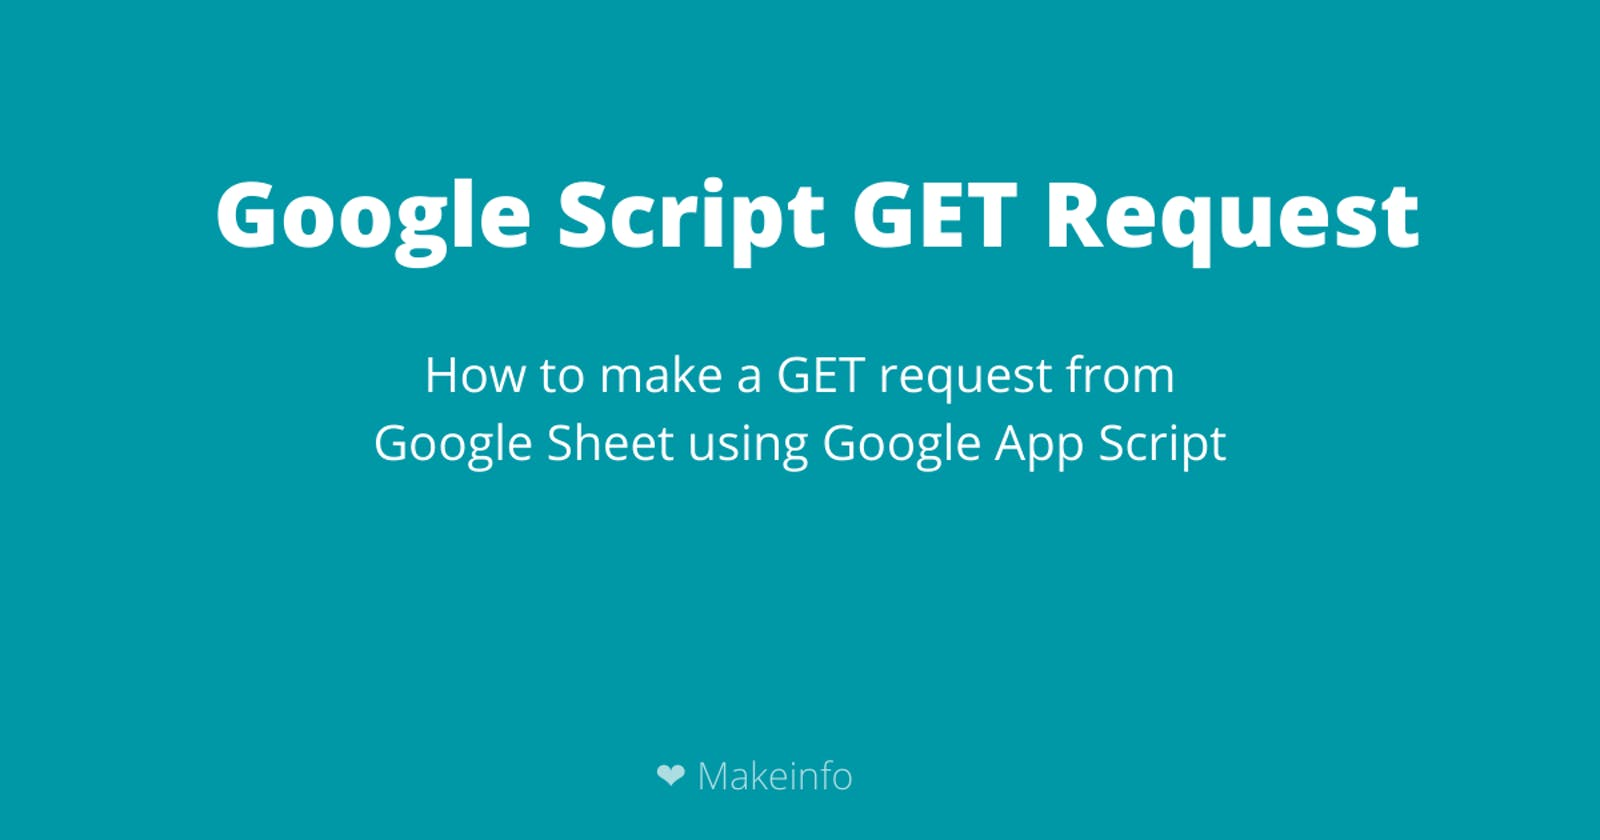 Google Script GET Request